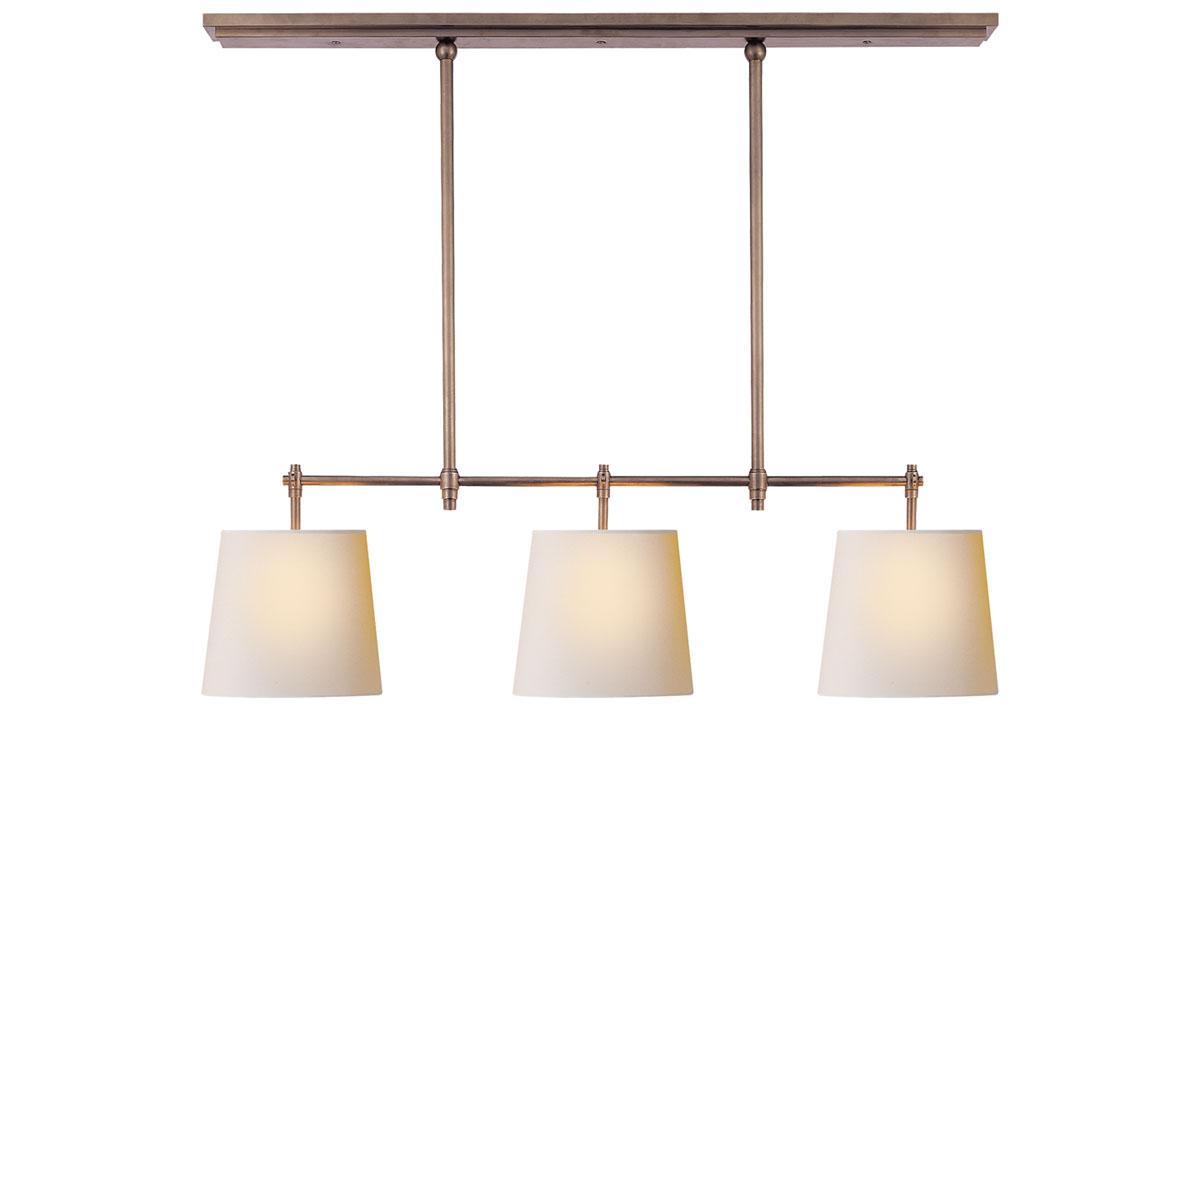 Visual comfort bryant small billiard pendant fixture neenas lighting antique nickel finish natural paper shade arubaitofo Gallery